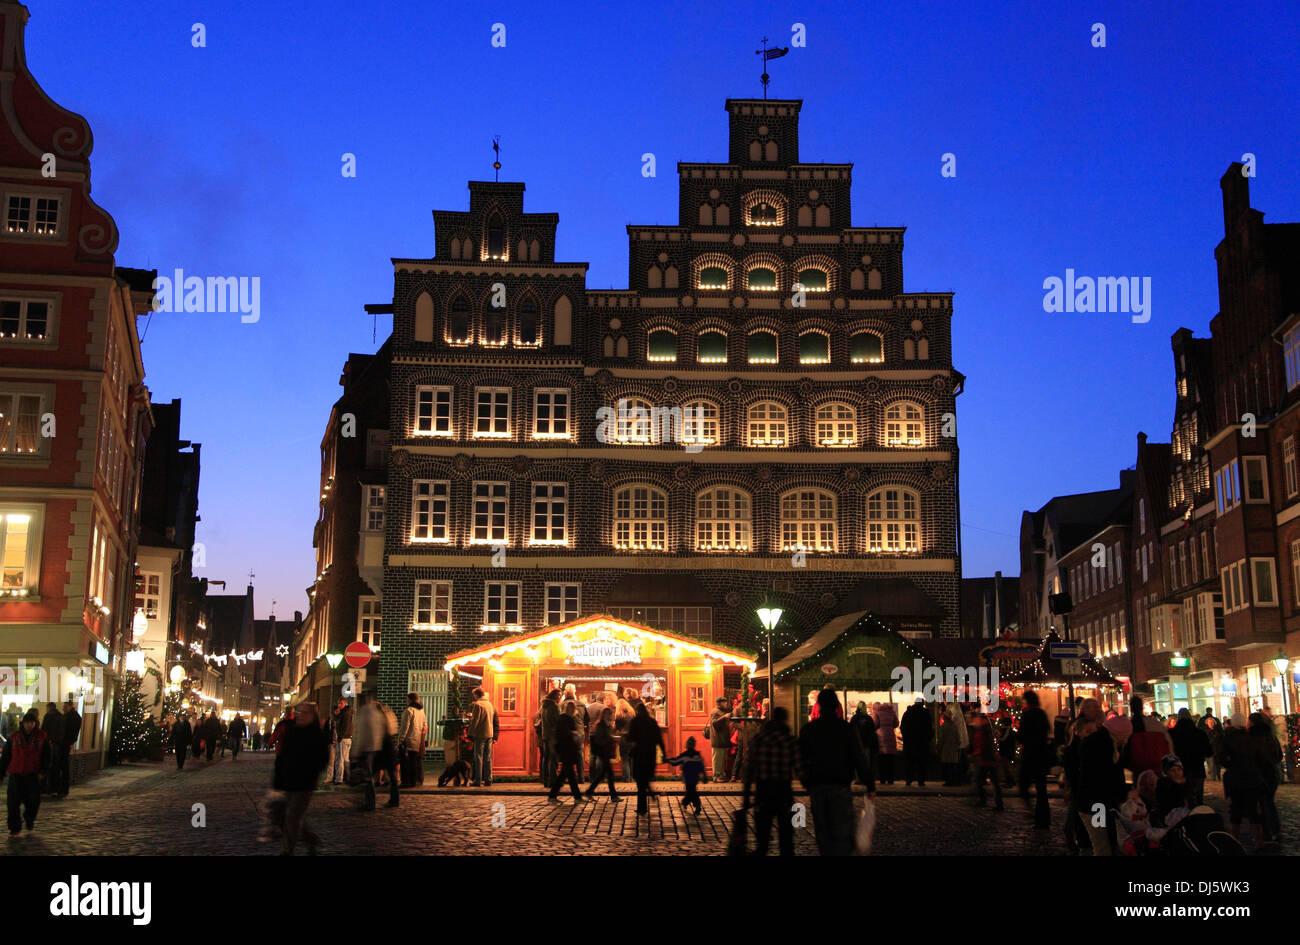 Square Am Sande, Christmas market, Lueneburg,  Lüneburg, Lower Saxony, Germany Stock Photo